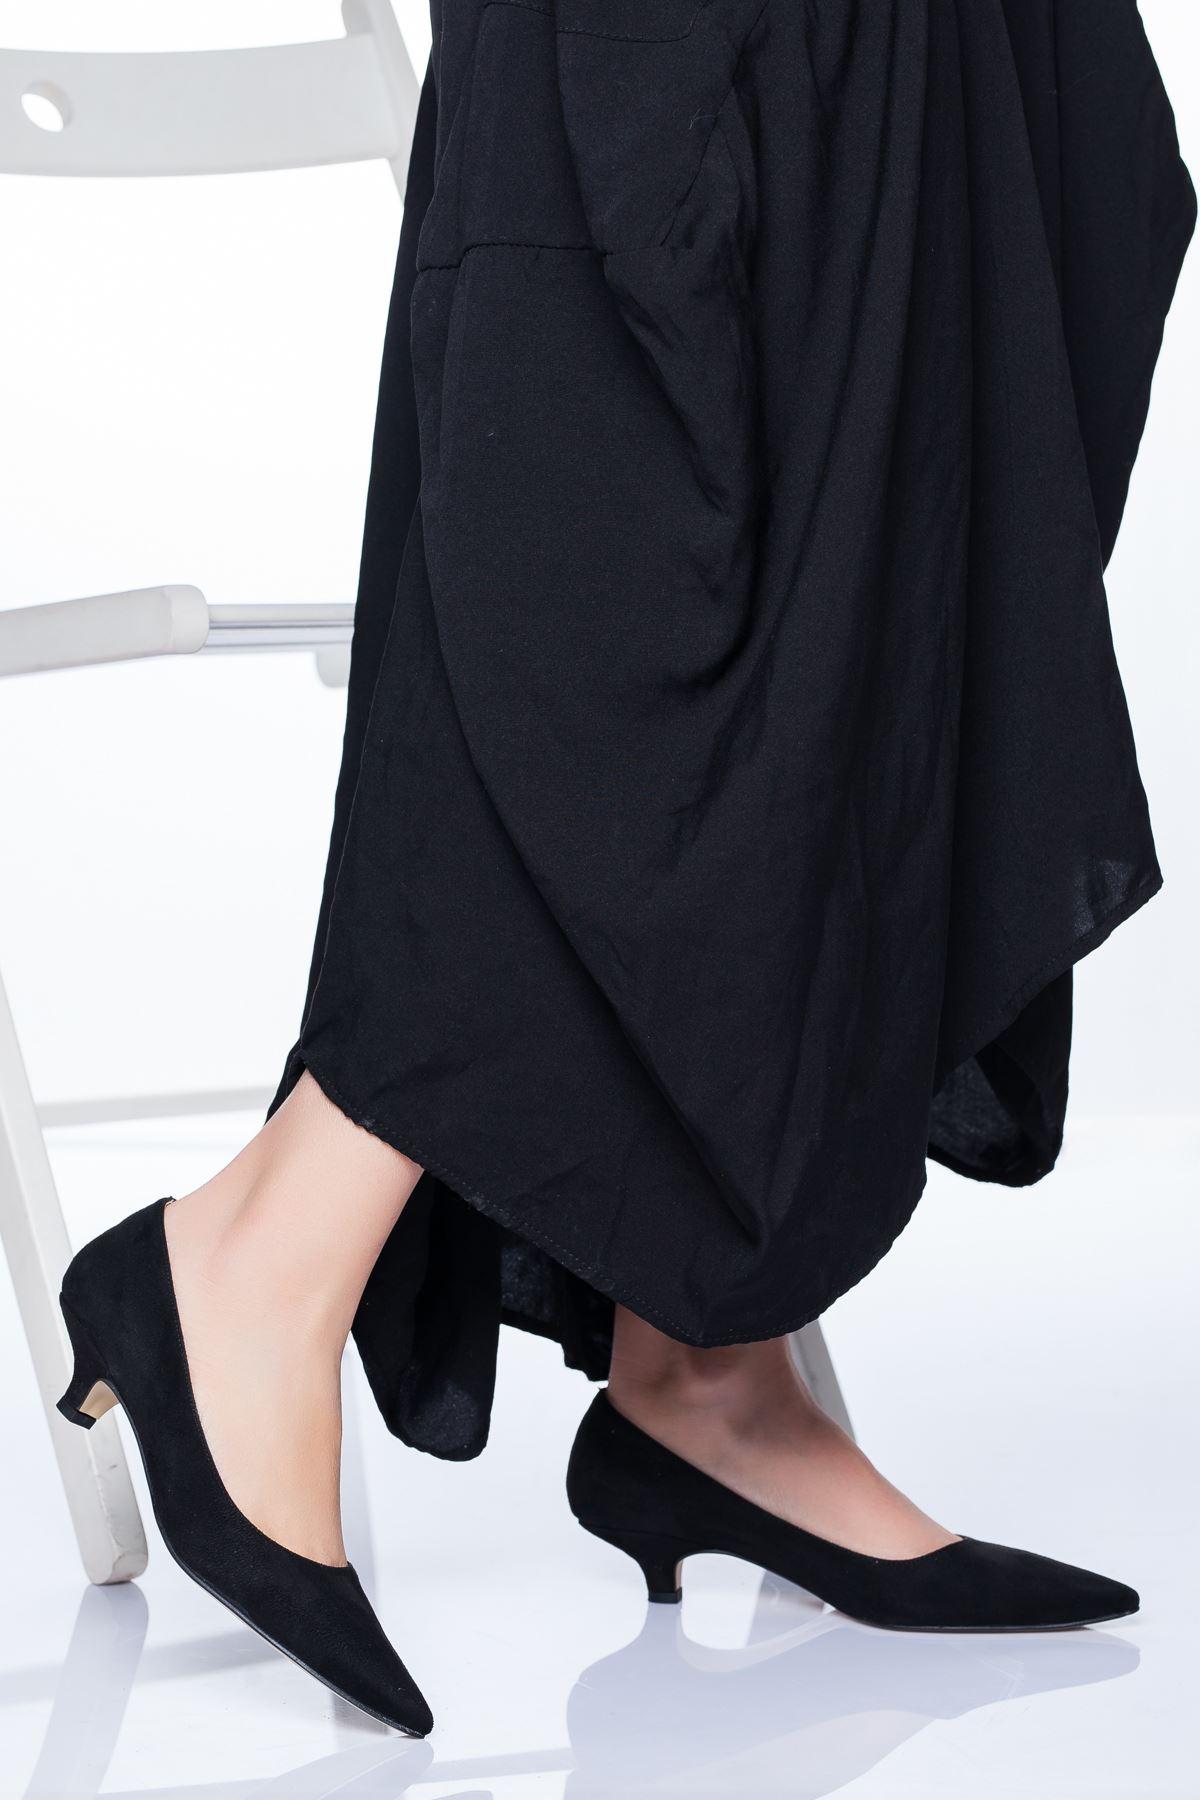 Odella Topuklu Ayakkabı SİYAH SÜET